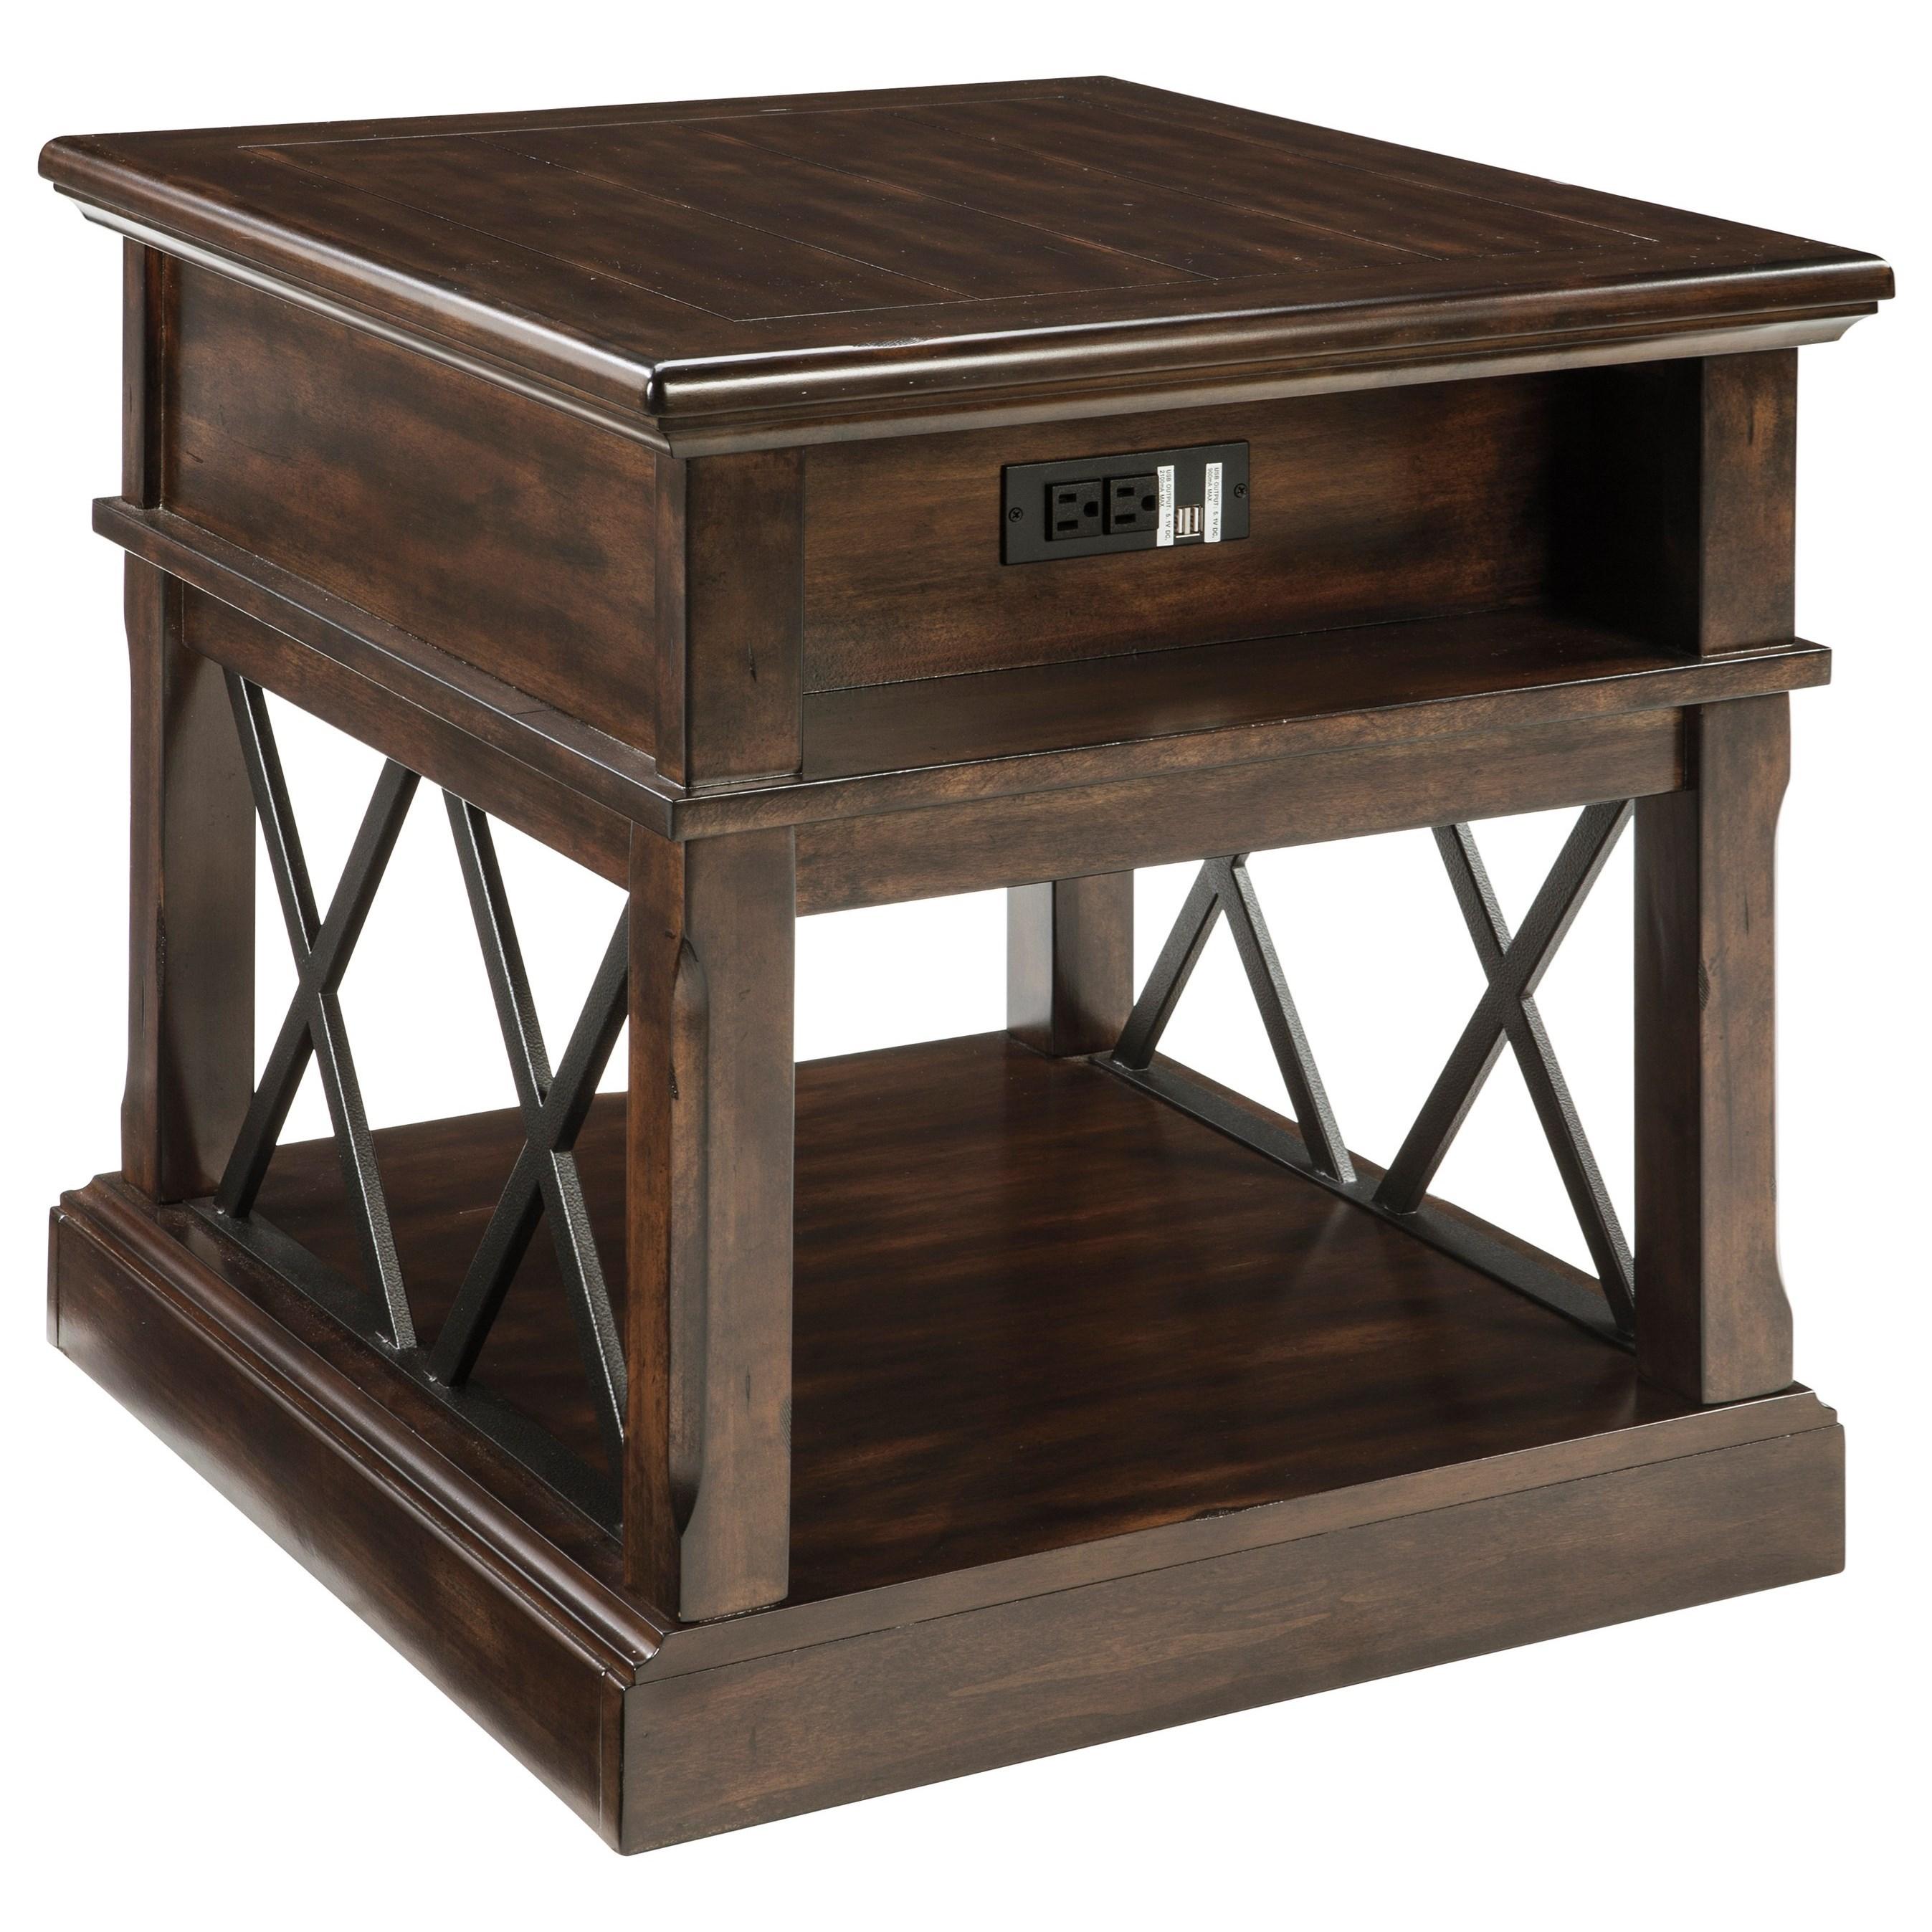 signature design by ashley roddinton rectangular end table with usb ports royal furniture. Black Bedroom Furniture Sets. Home Design Ideas